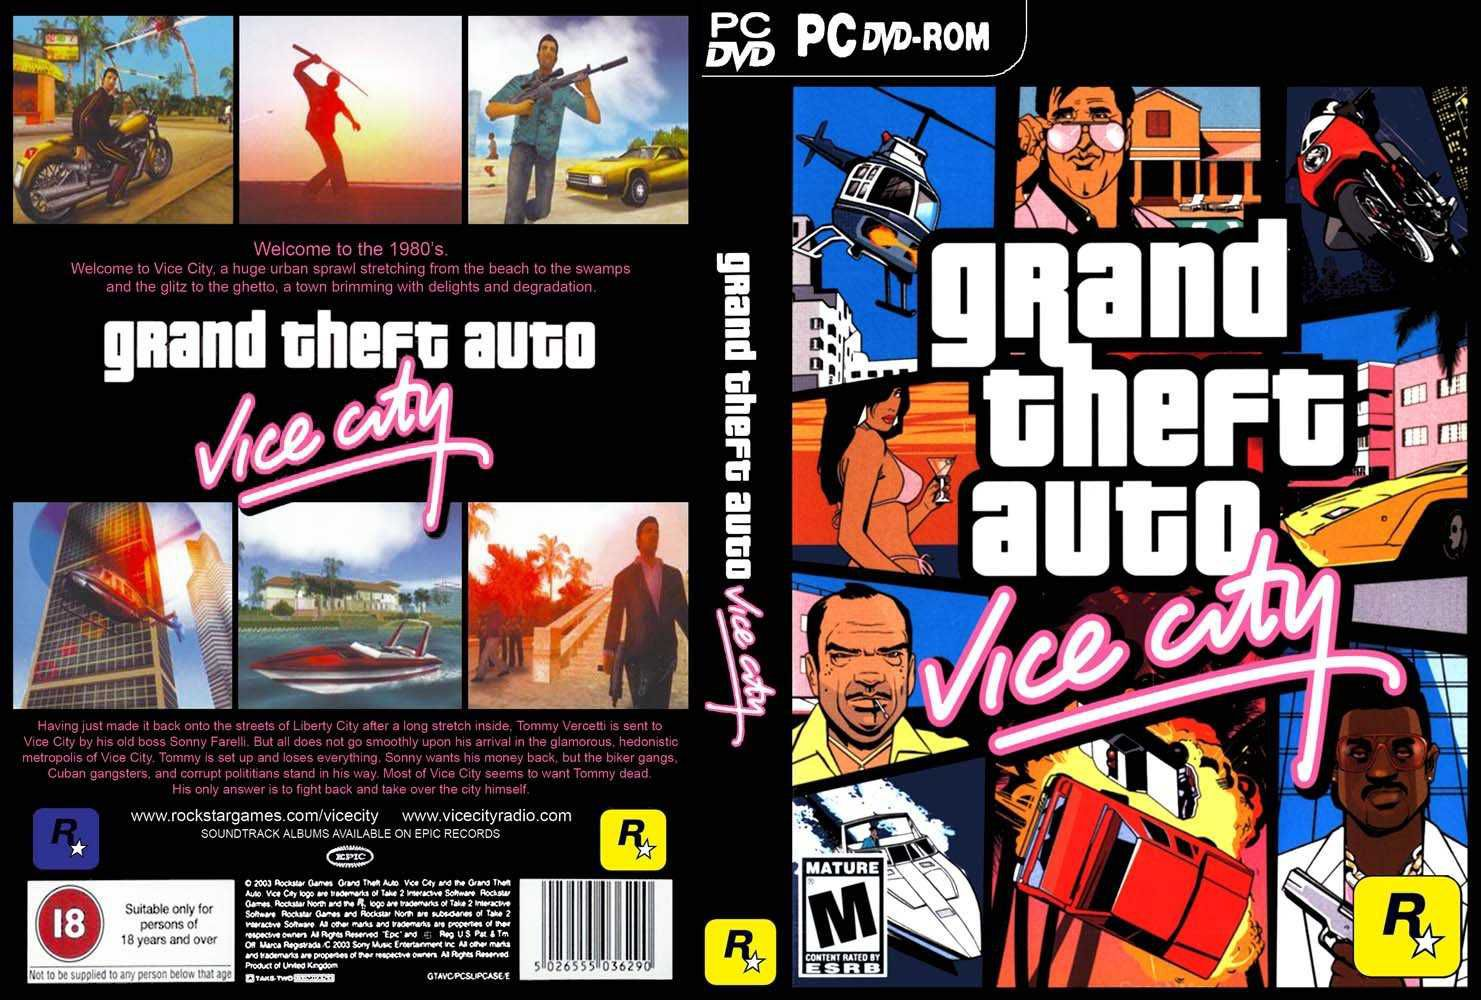 gta 5 rockstar games free download for pc